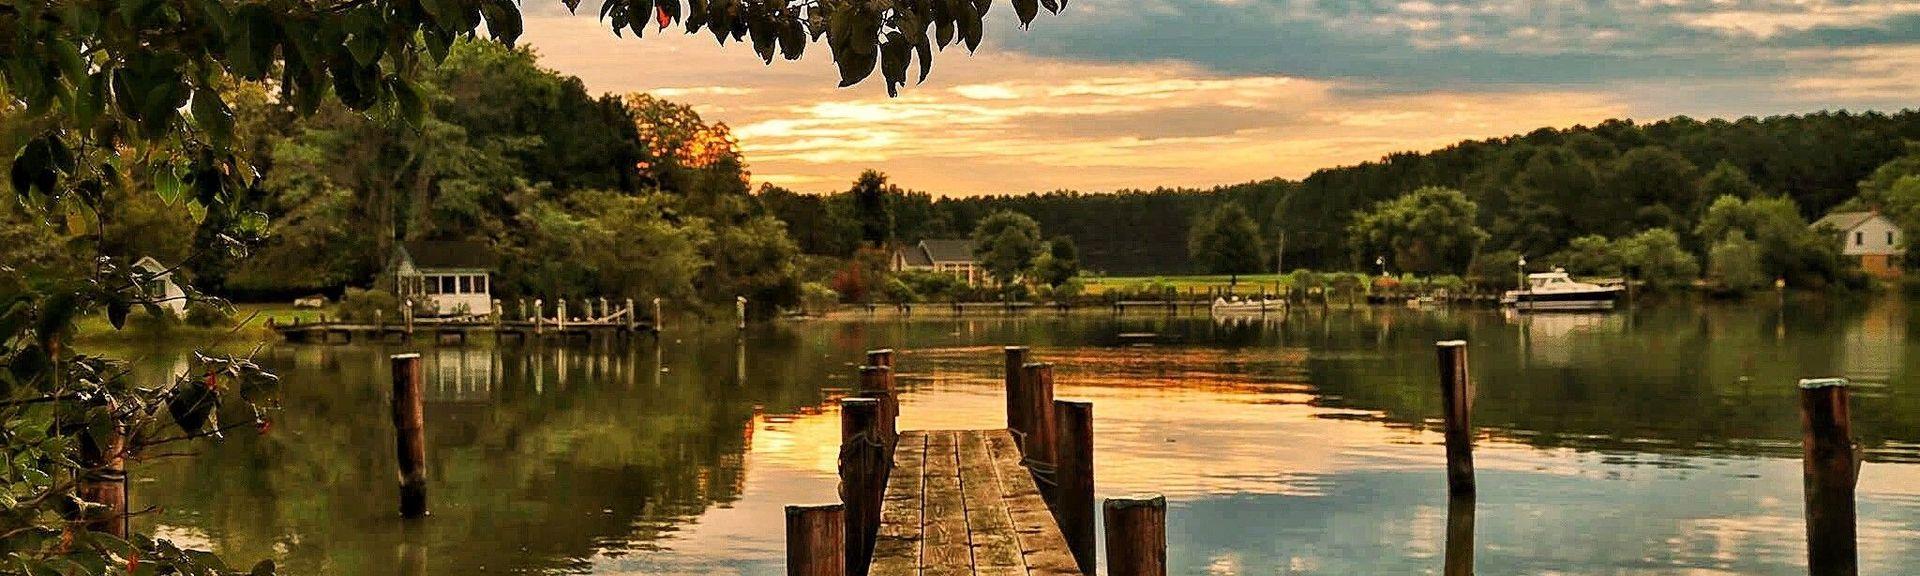 Royal Oak, Maryland, USA